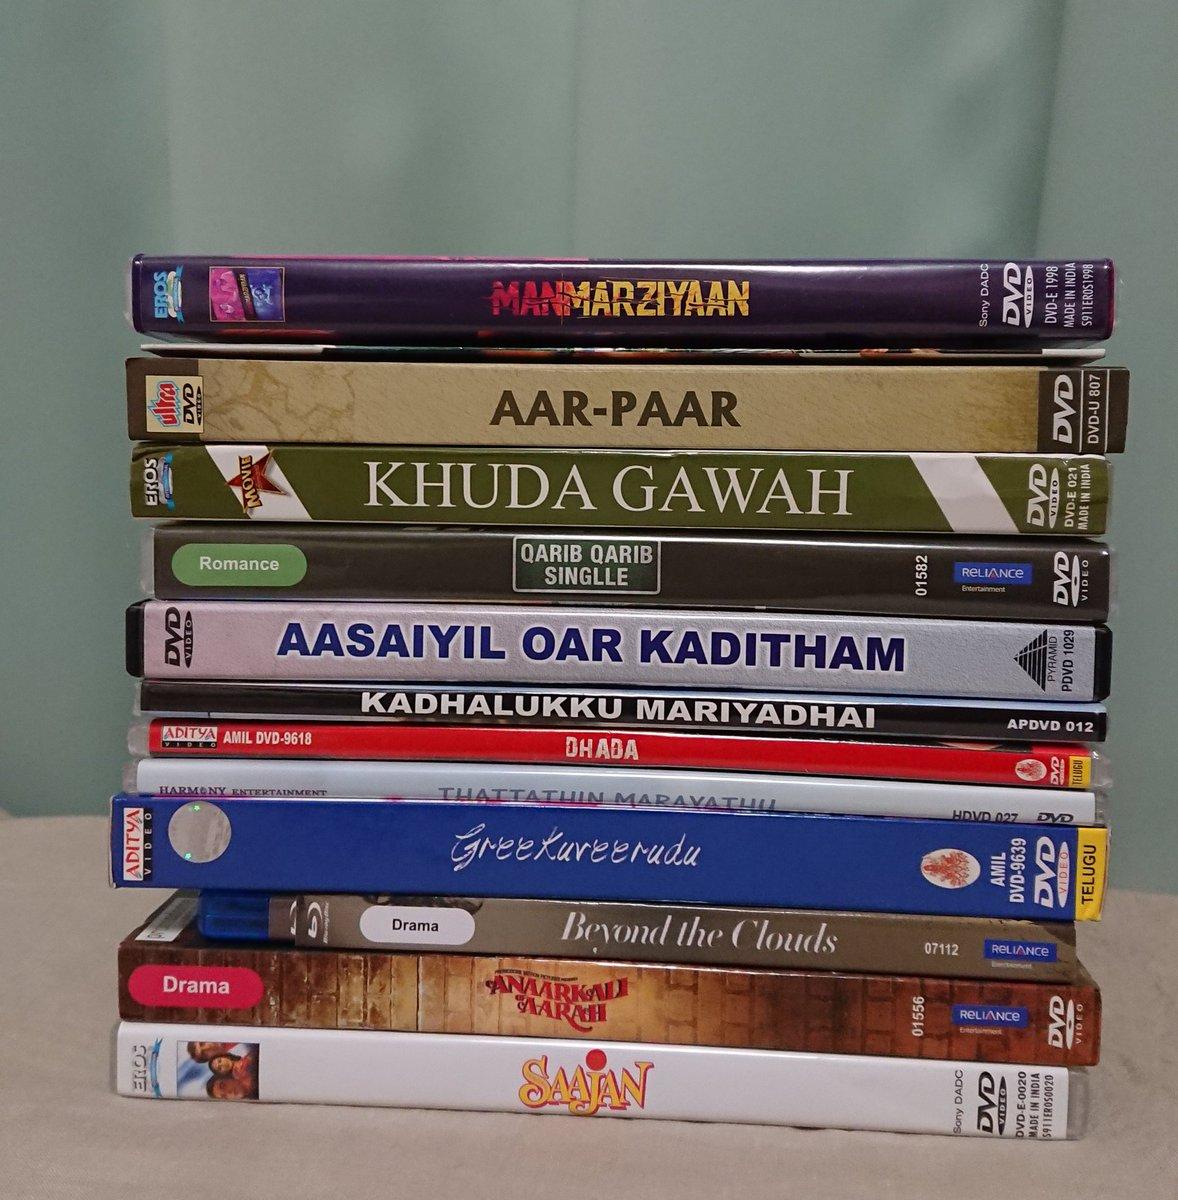 f:id:komeindiafilm:20190510235327j:plain